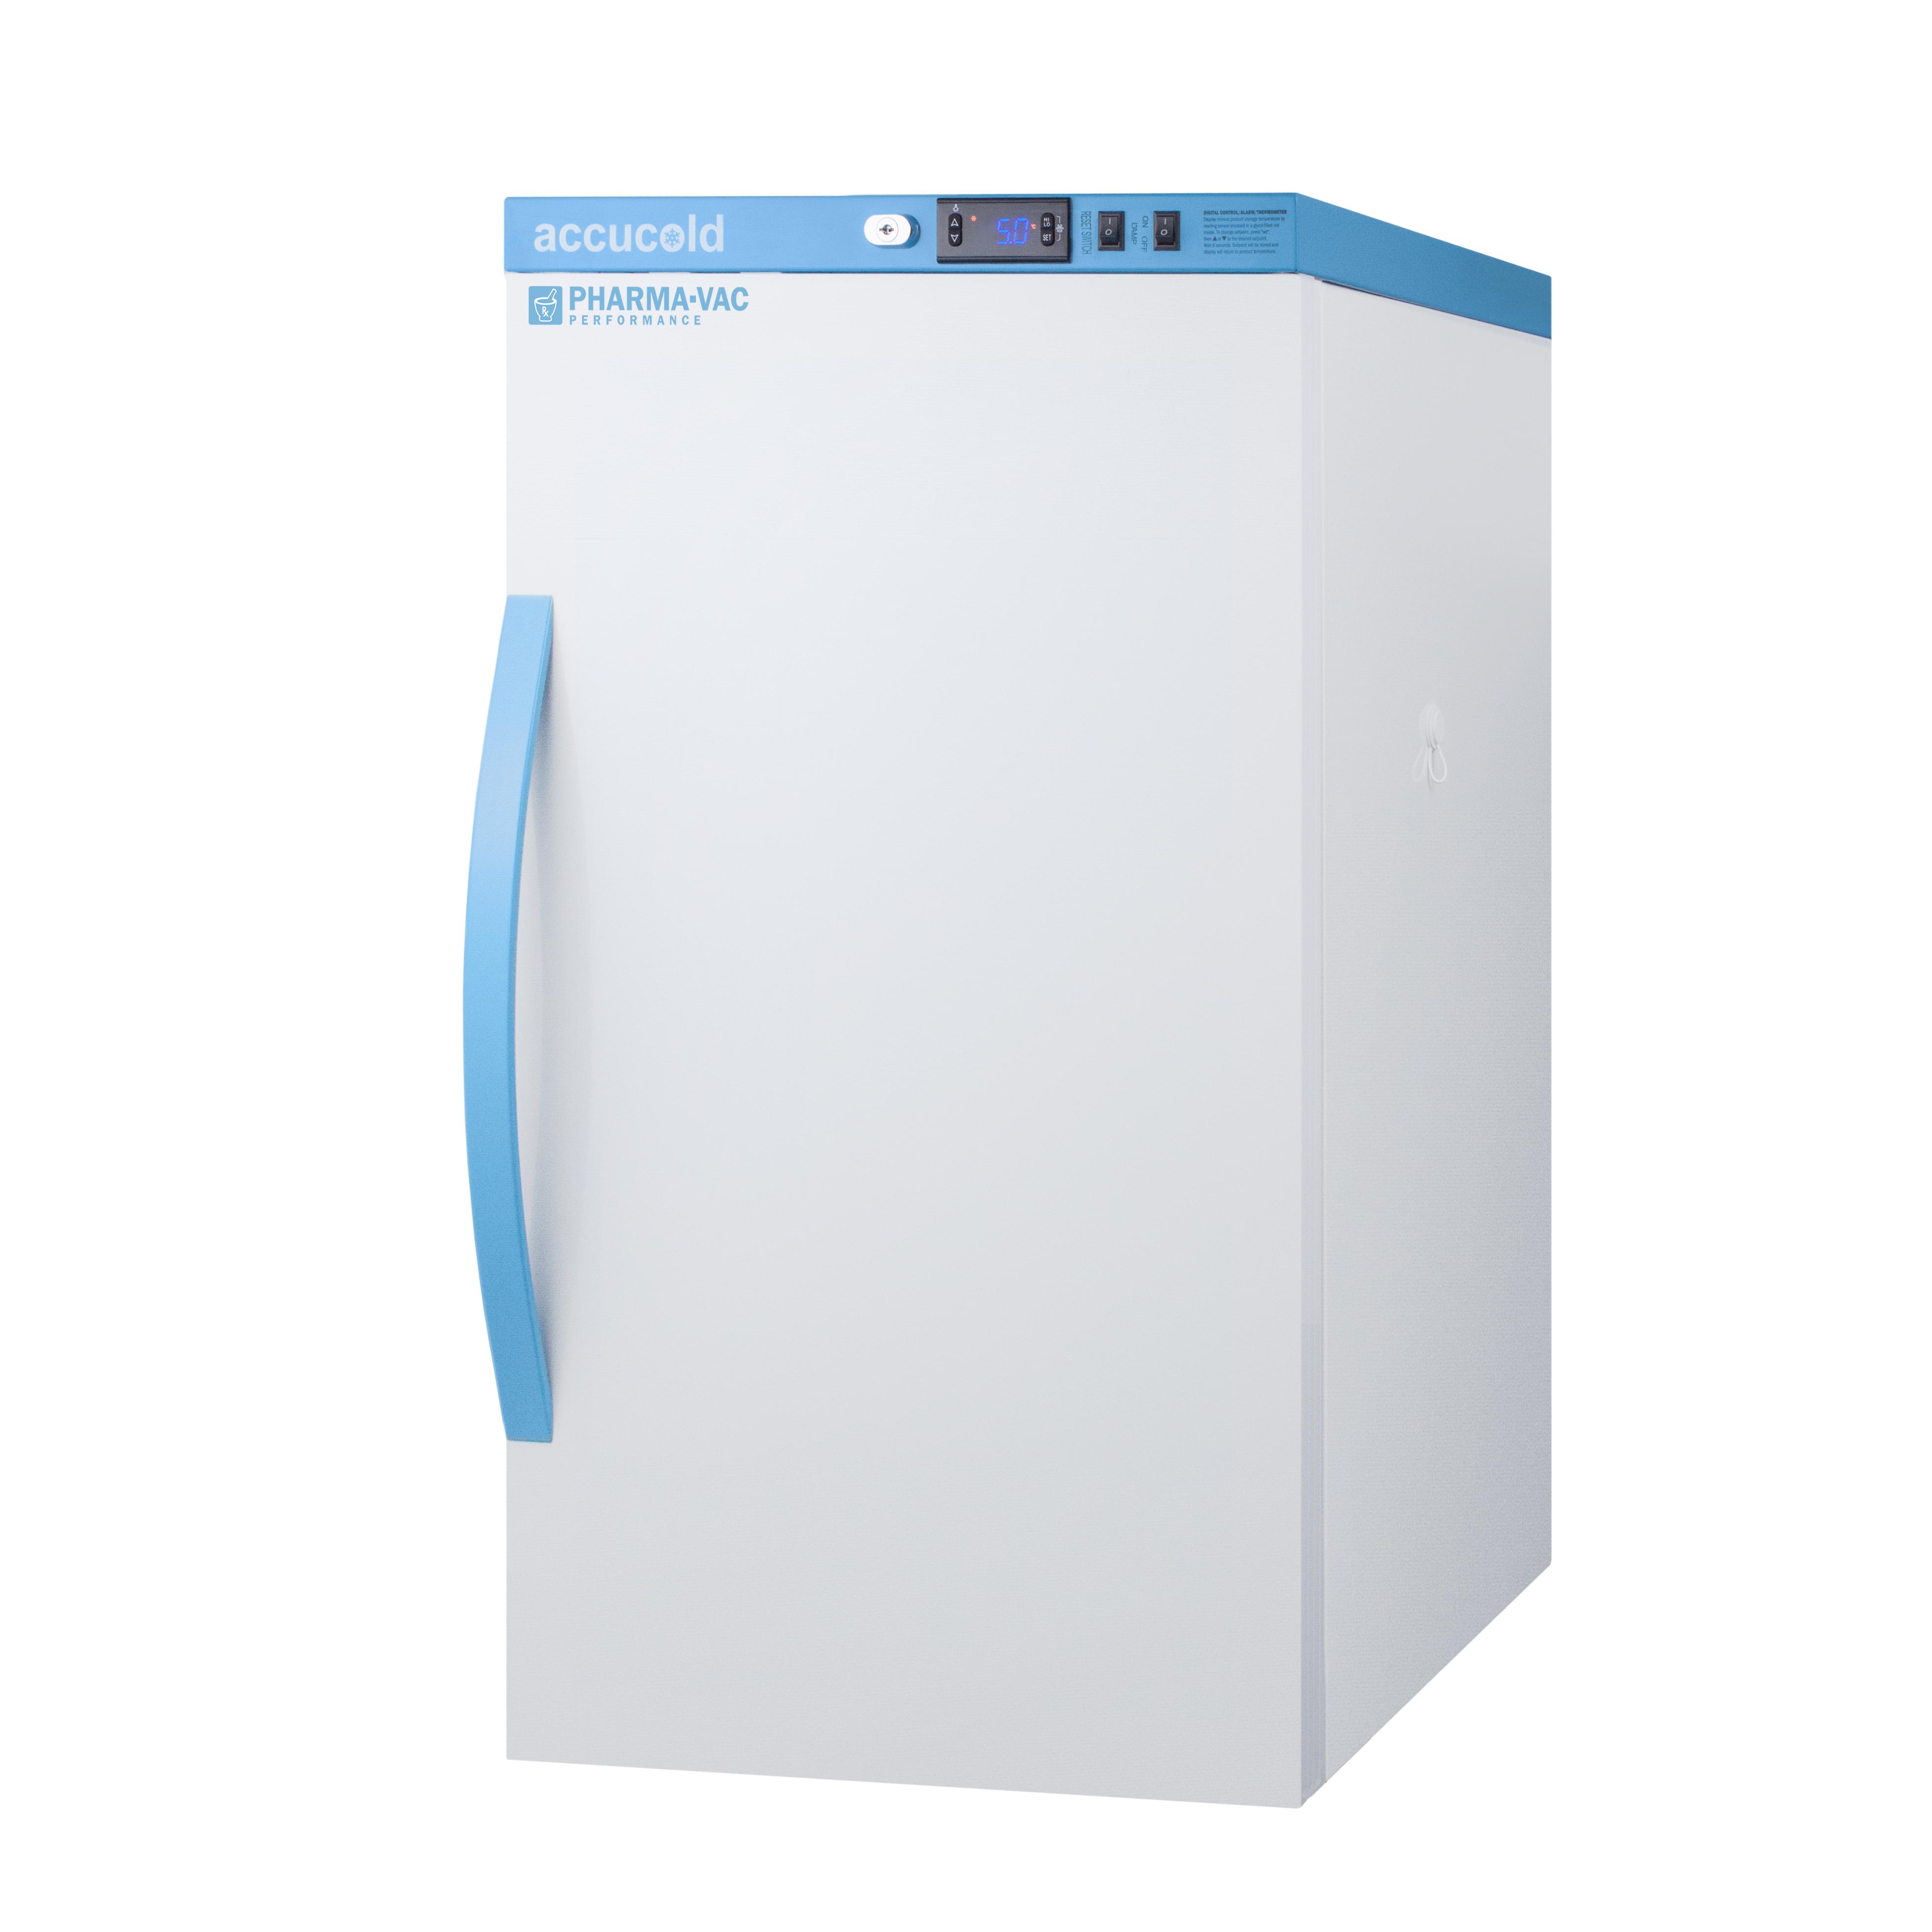 Summit Appliance ARS3PV refrigerator, medical